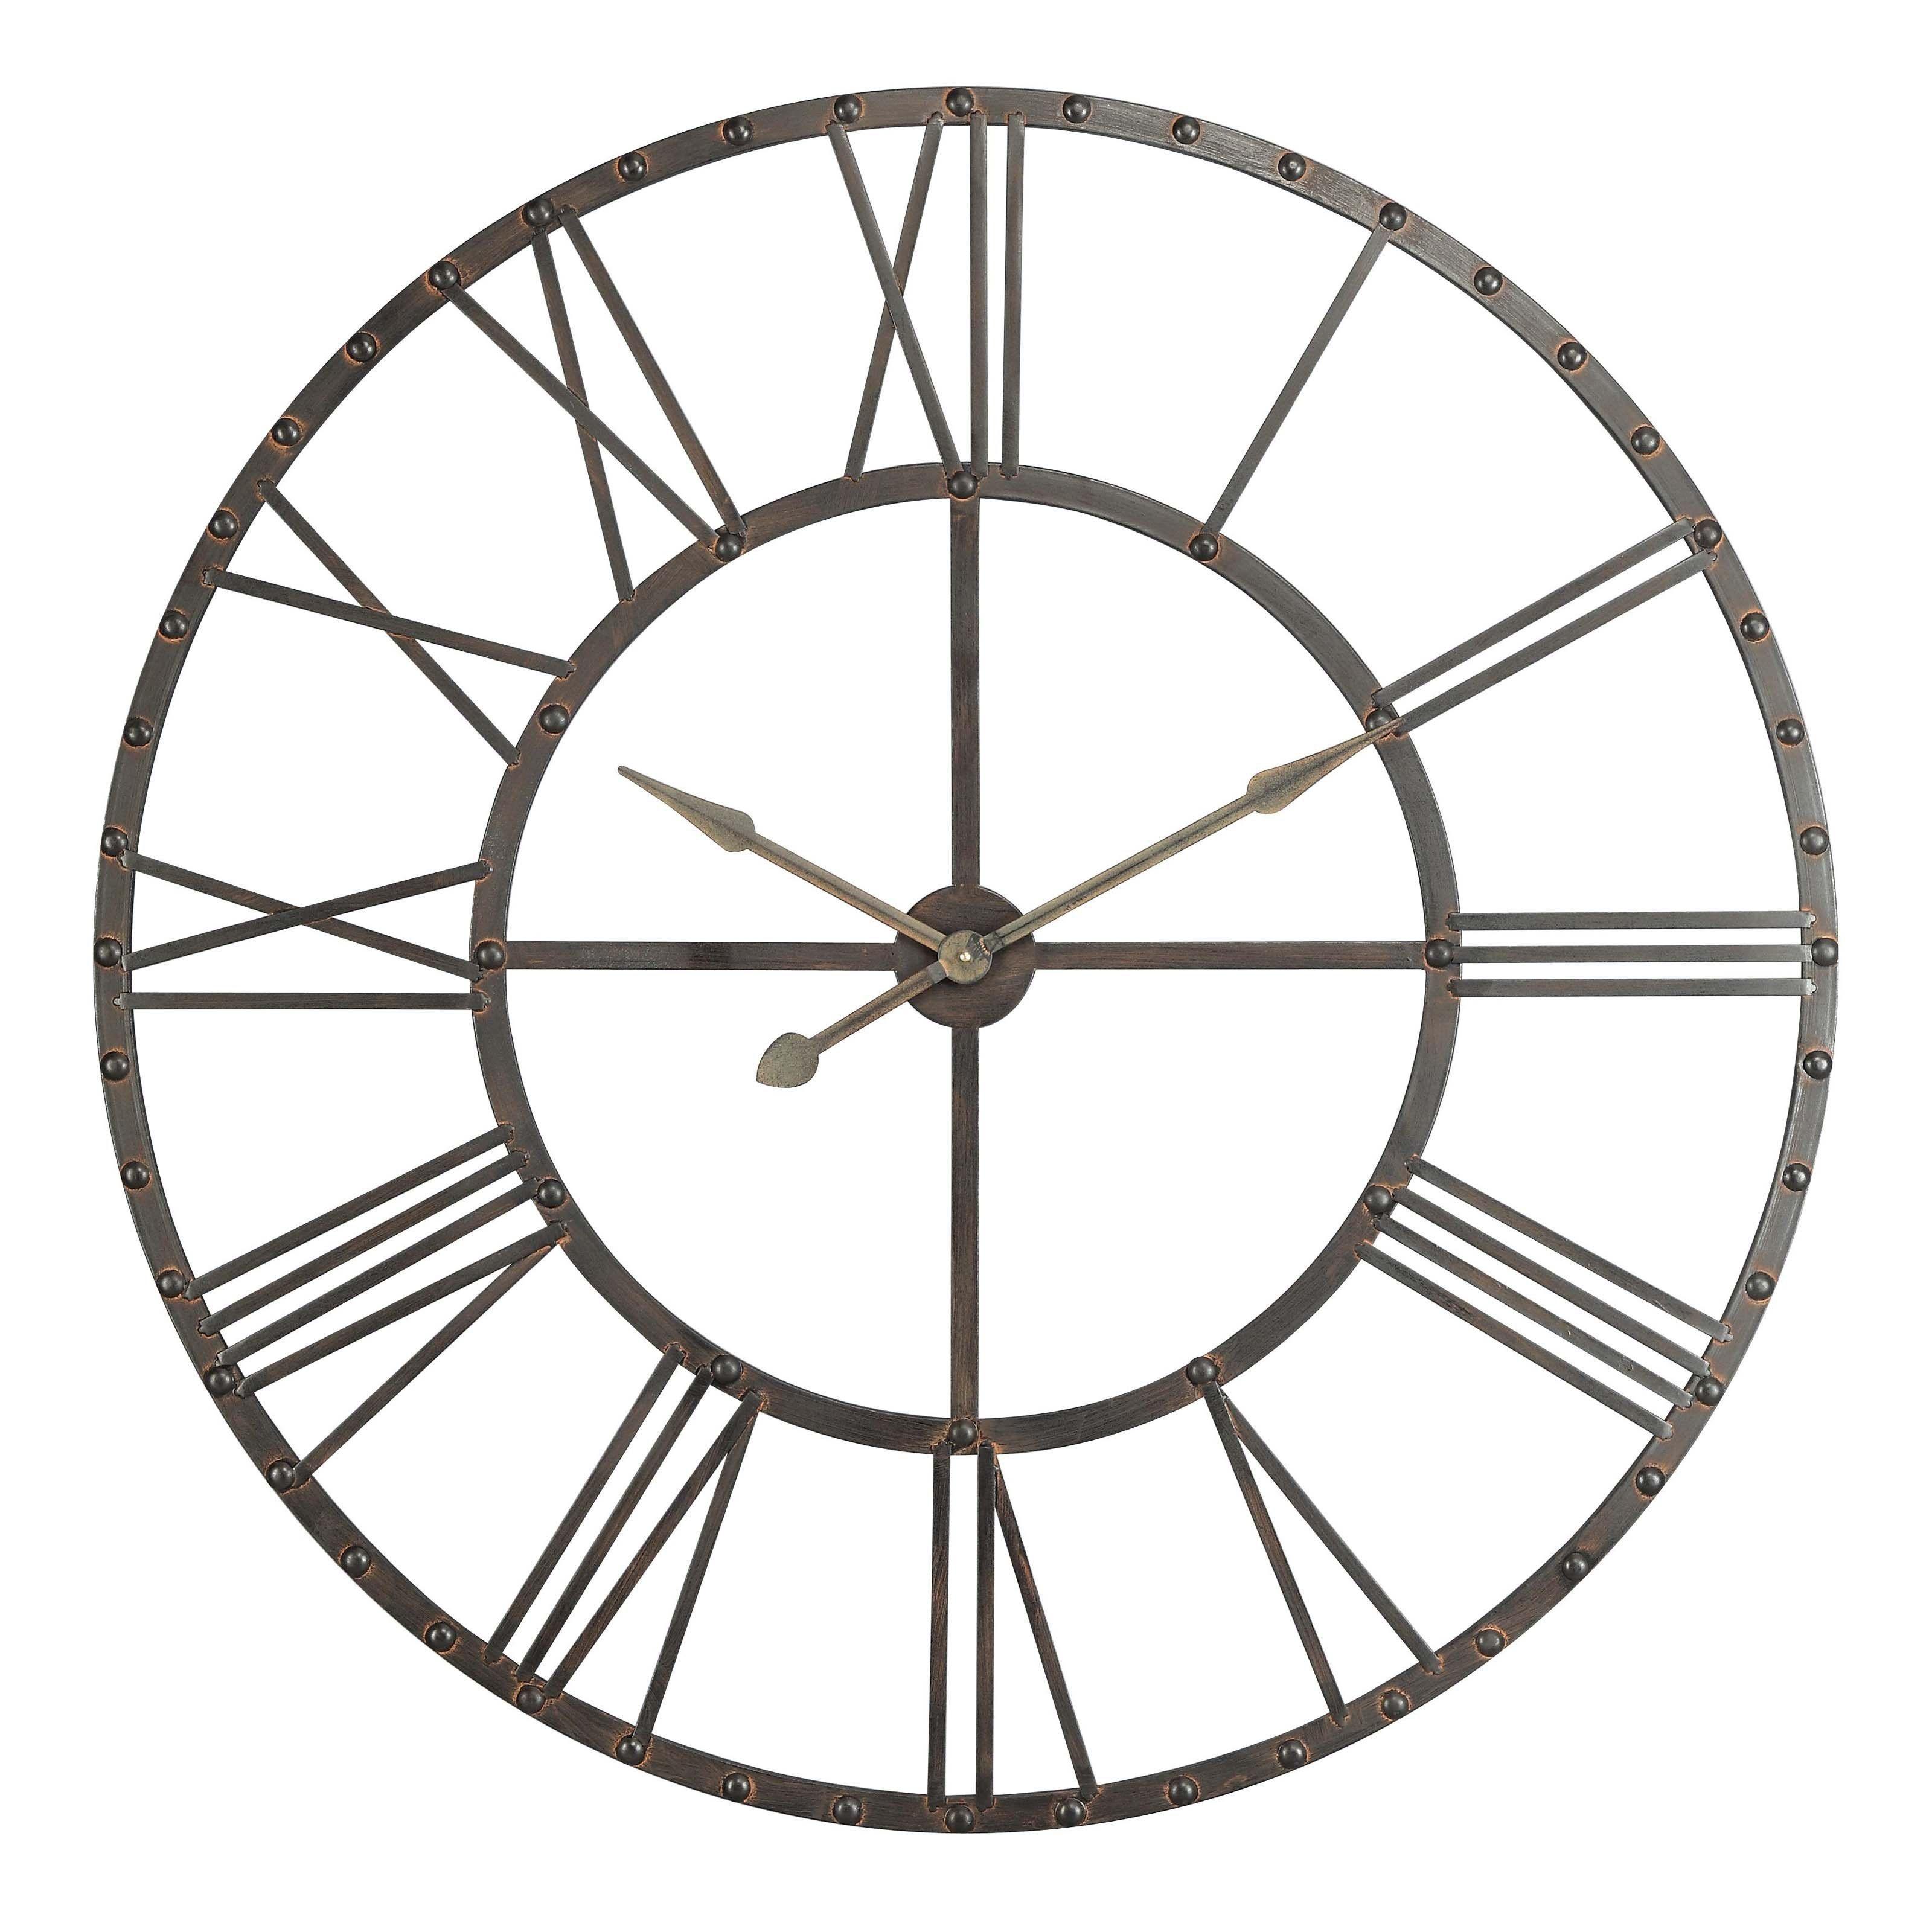 Upton Oversized Wall Clock 44 5 Diam In Www Hayneedle Com Gold Outdoor Clocks